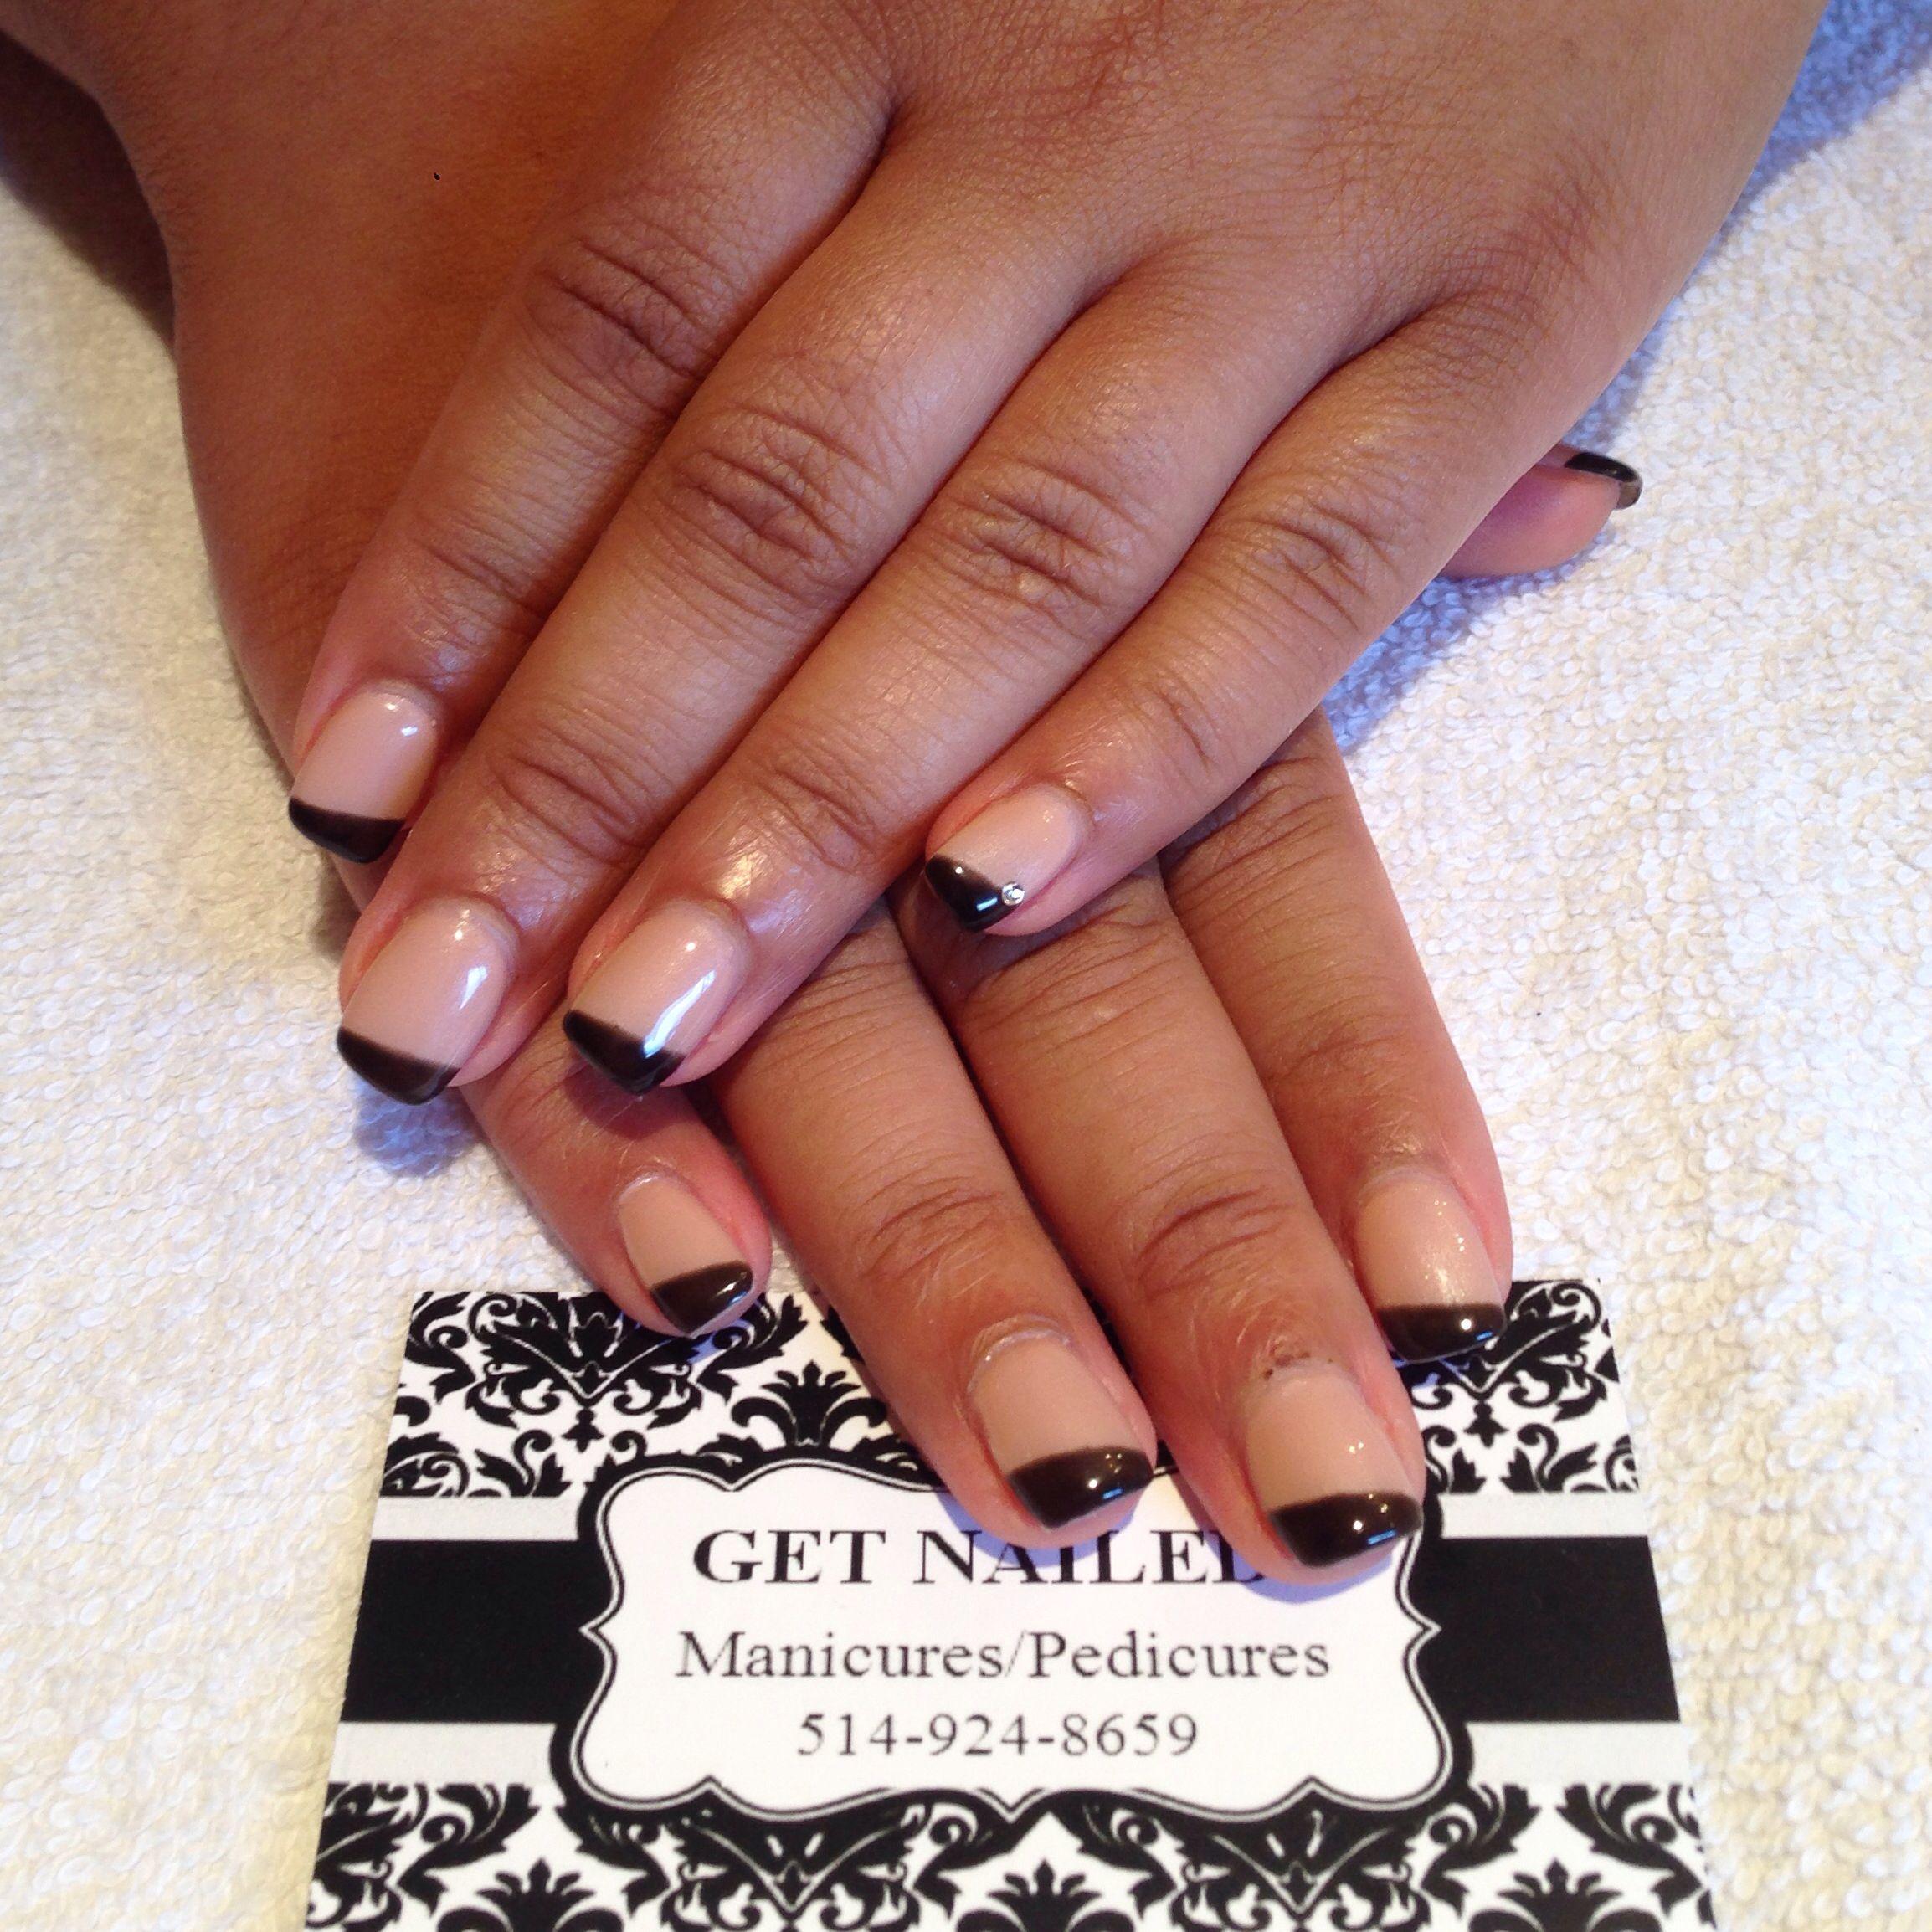 Gel Nails + Nail Art! #gel#getnailed#manicure#hands#nails#nailart#diamond#french#beige#black#tips#cnd#fashion#makeappt<3